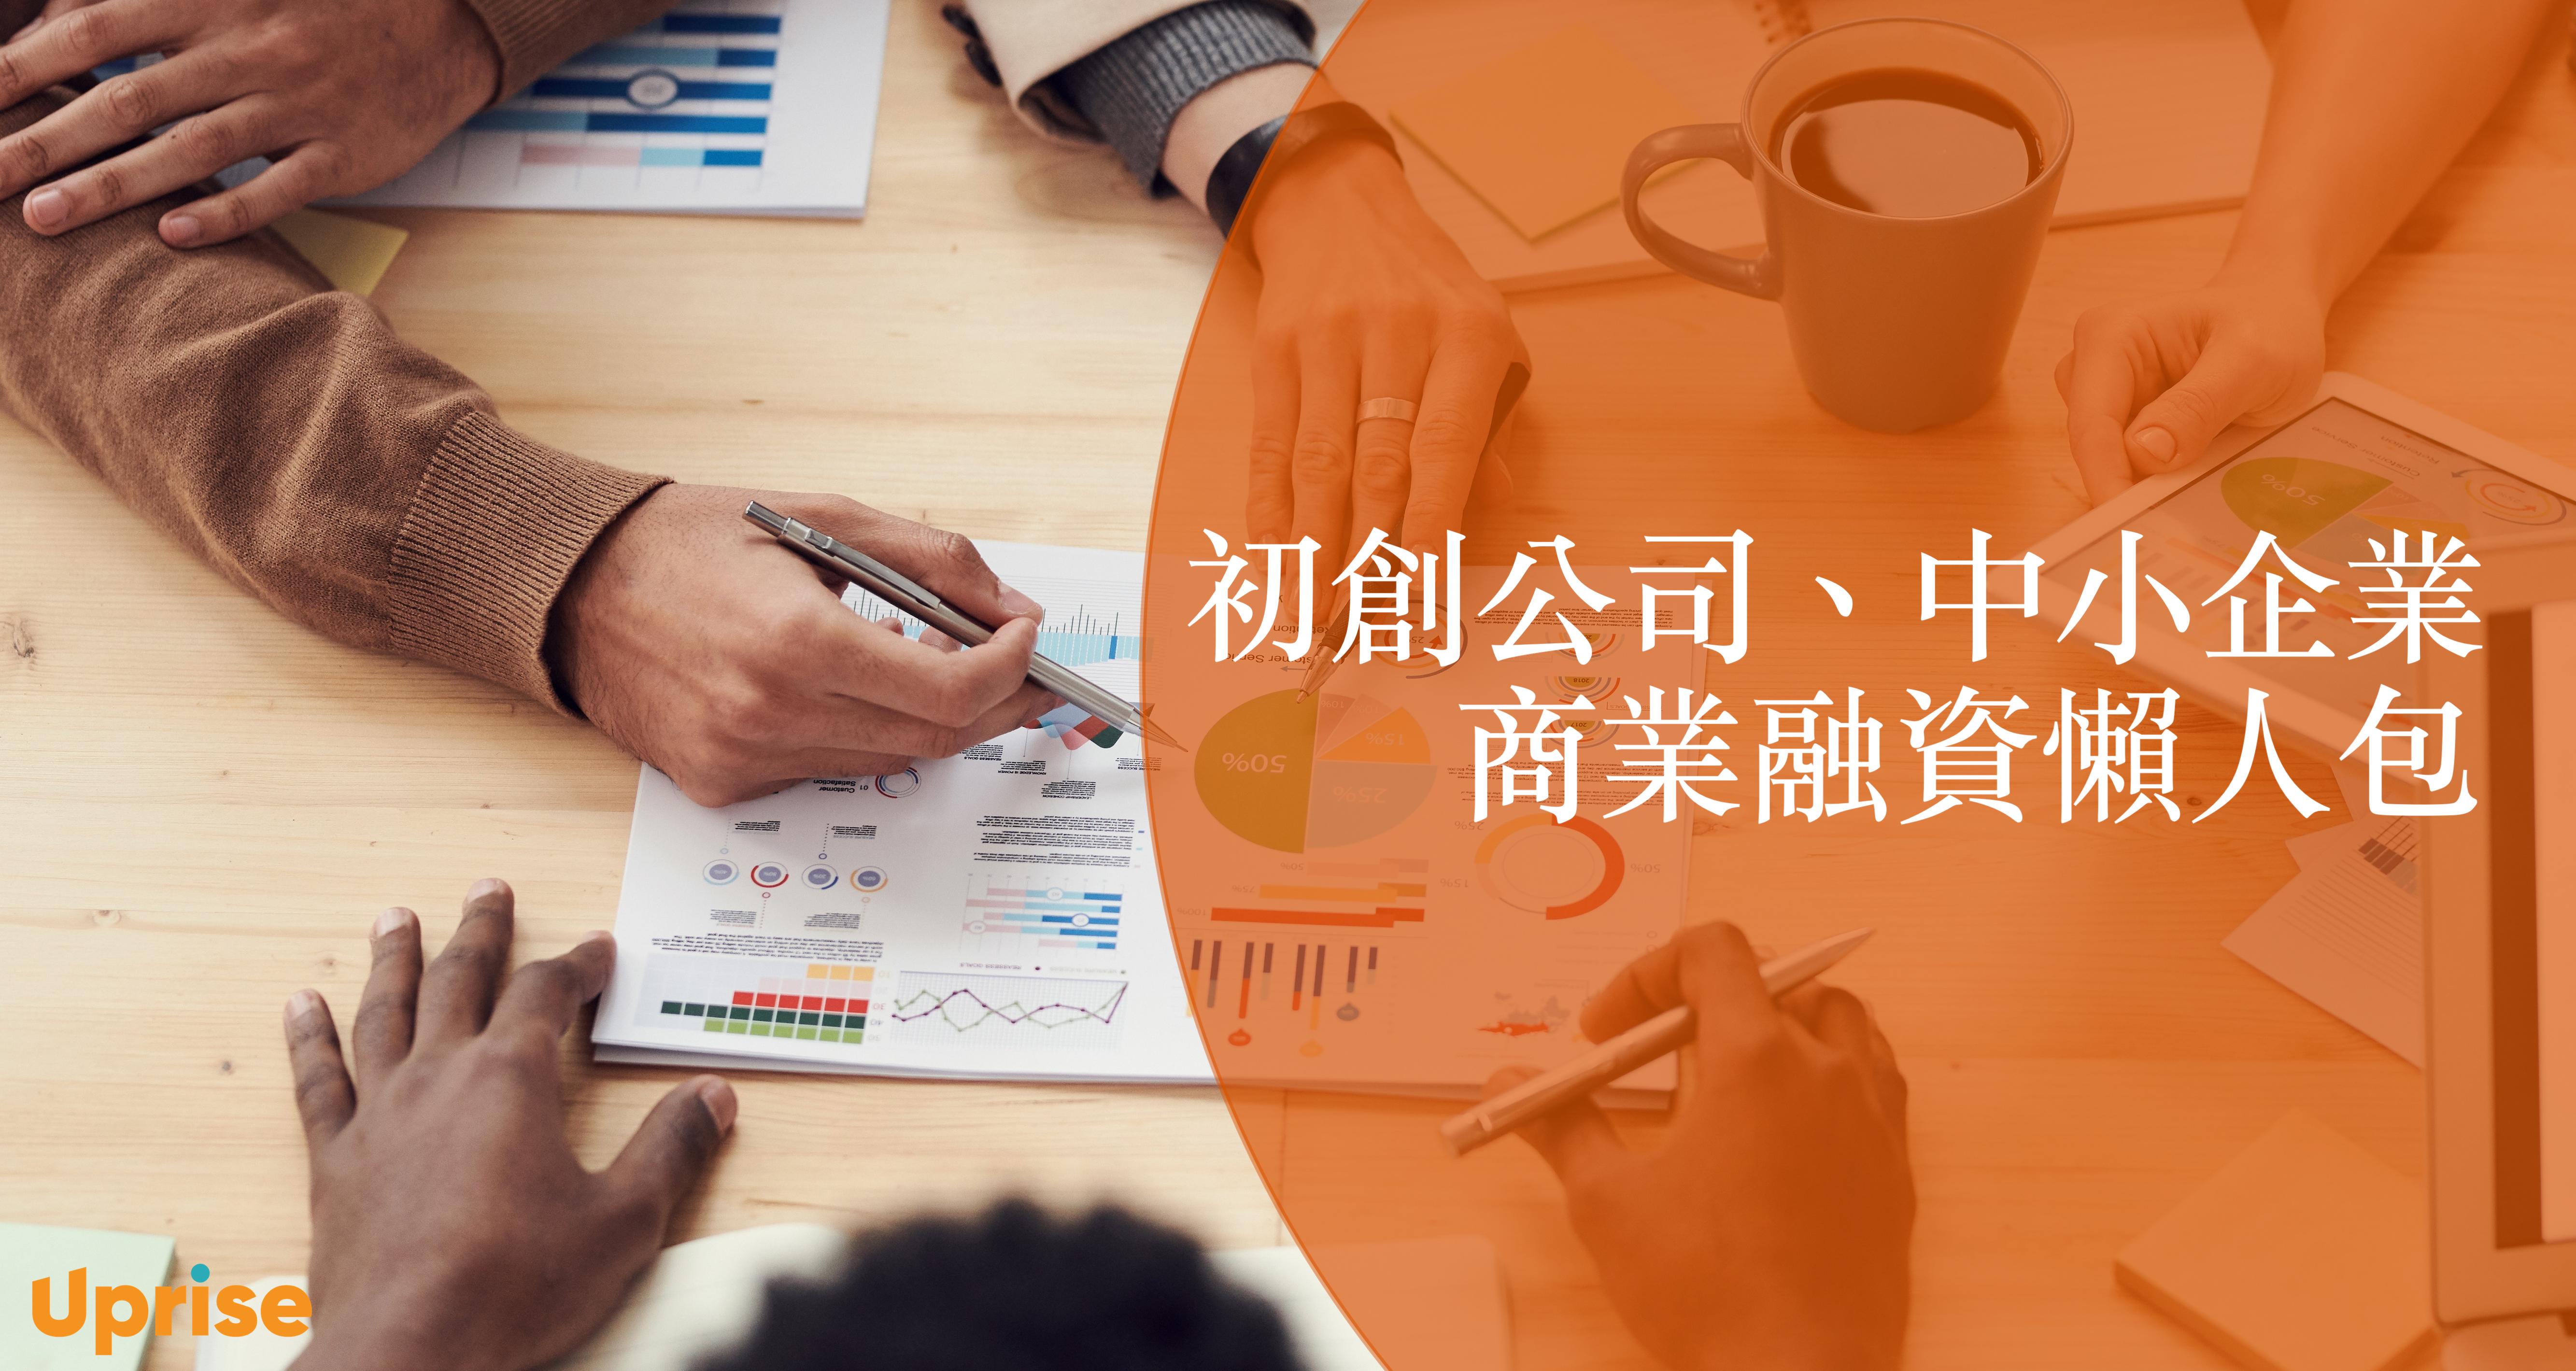 Uprise - Business Insights - Startup 初創公司、中小企業融資懶人包(附網上借貸注意事項)